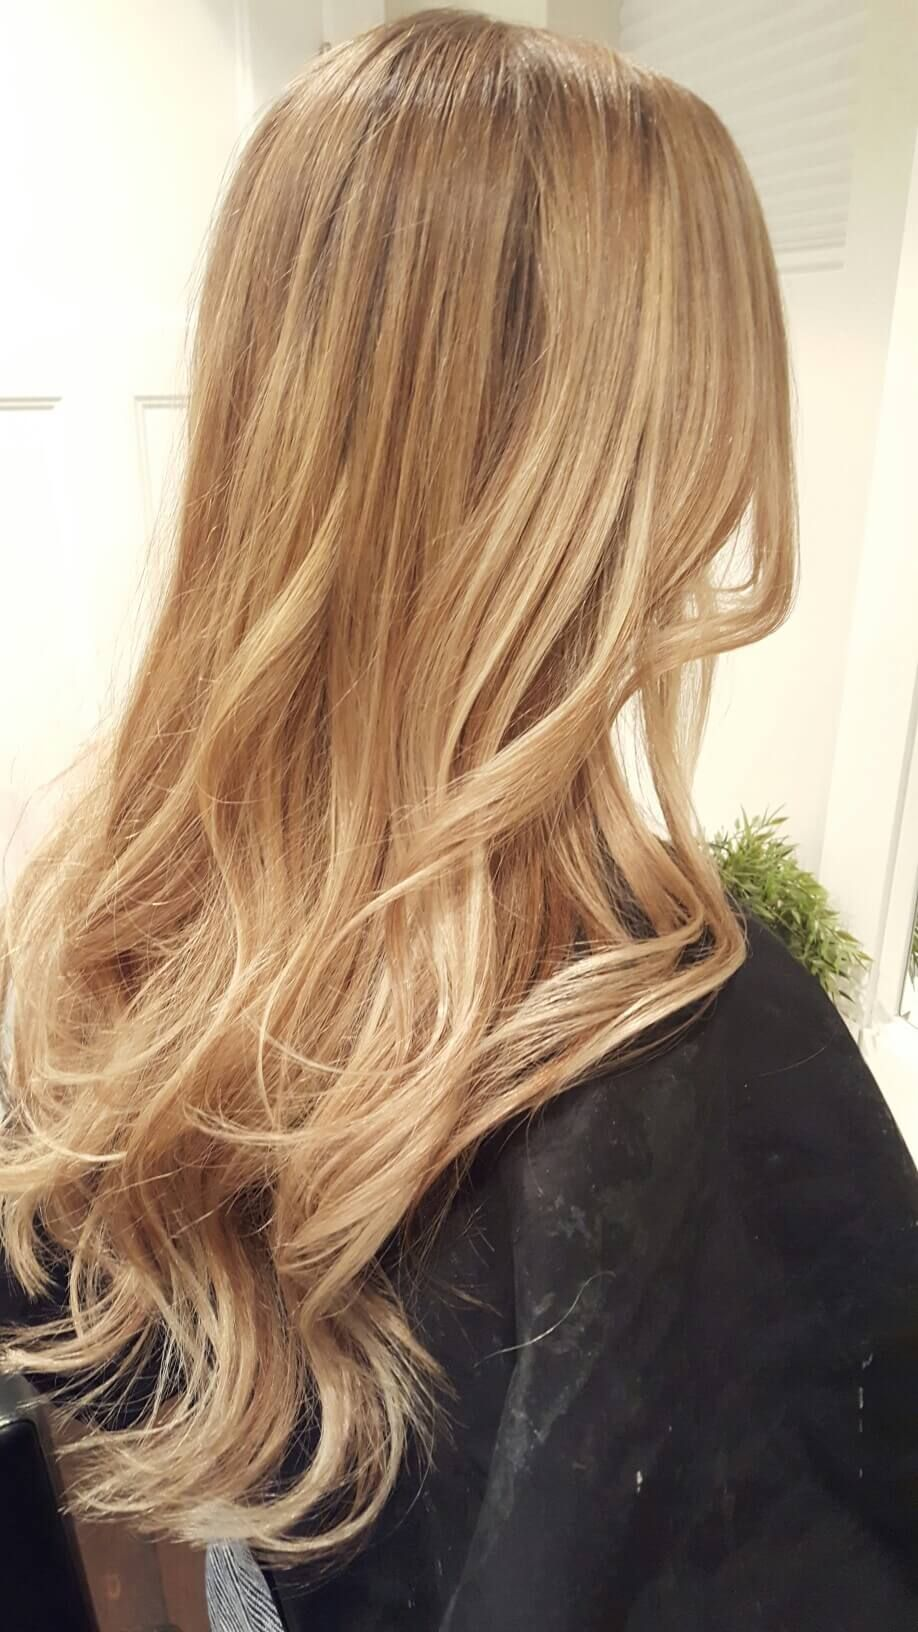 25 Honey Blonde Haircolor Ideas That Are Simply Gorgeous Honey Blonde Hair Honey Blonde Hair Color Honey Hair